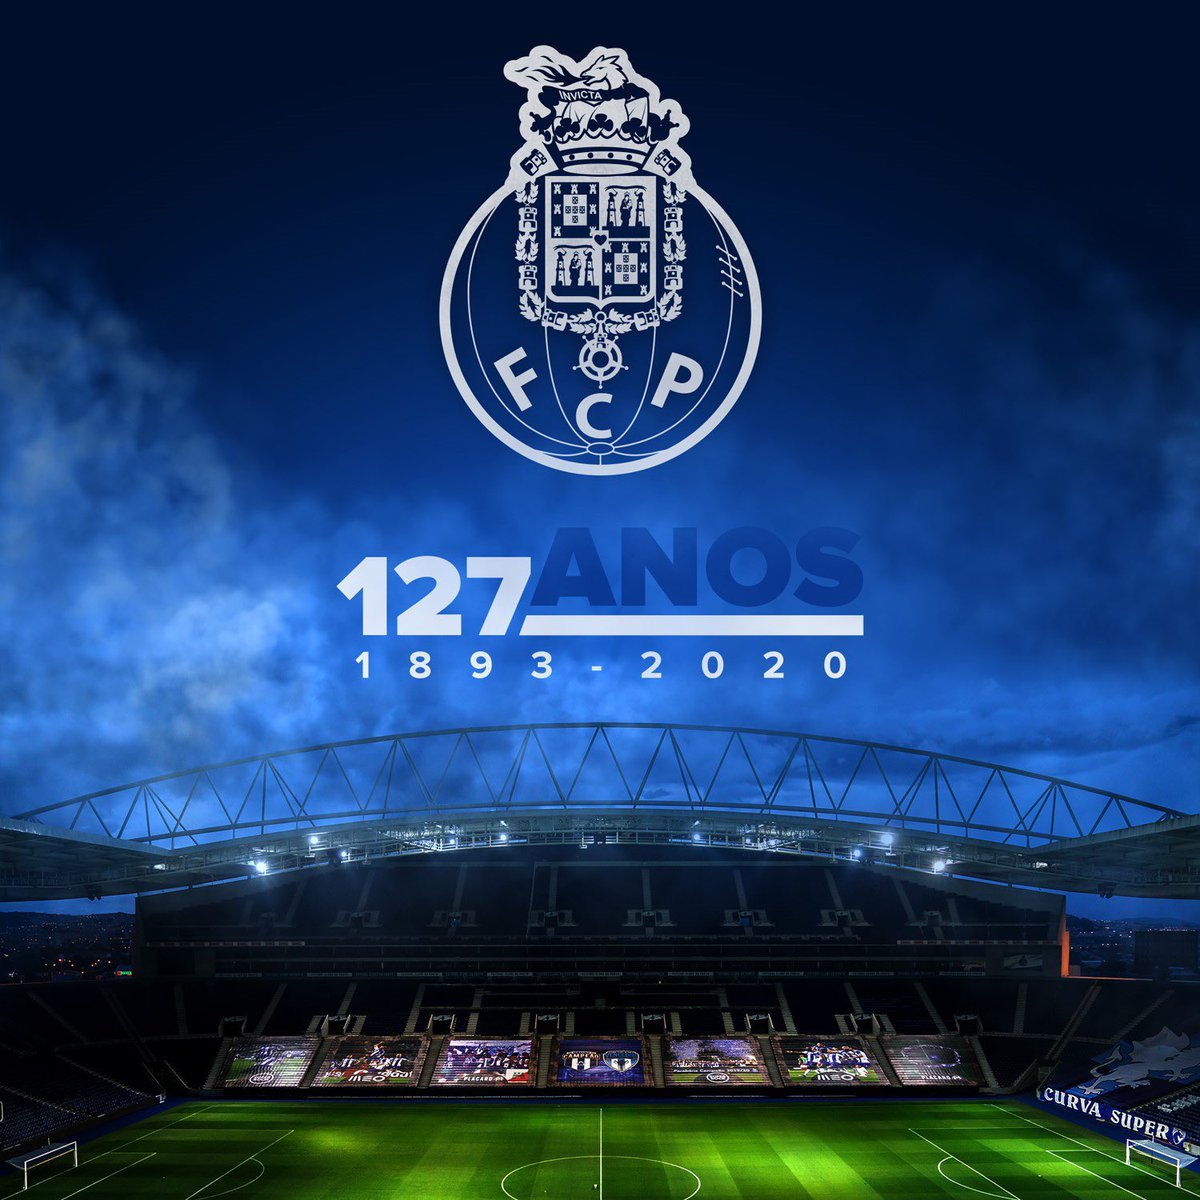 Felicidades @FCPorto pelos 127 anos de História! 127 anos de vitórias sem igual.... Porto, Porto, Porto 🔵⚪️ #FCPorto127 #NaçaoPorto https://t.co/k3bxc3lfK7